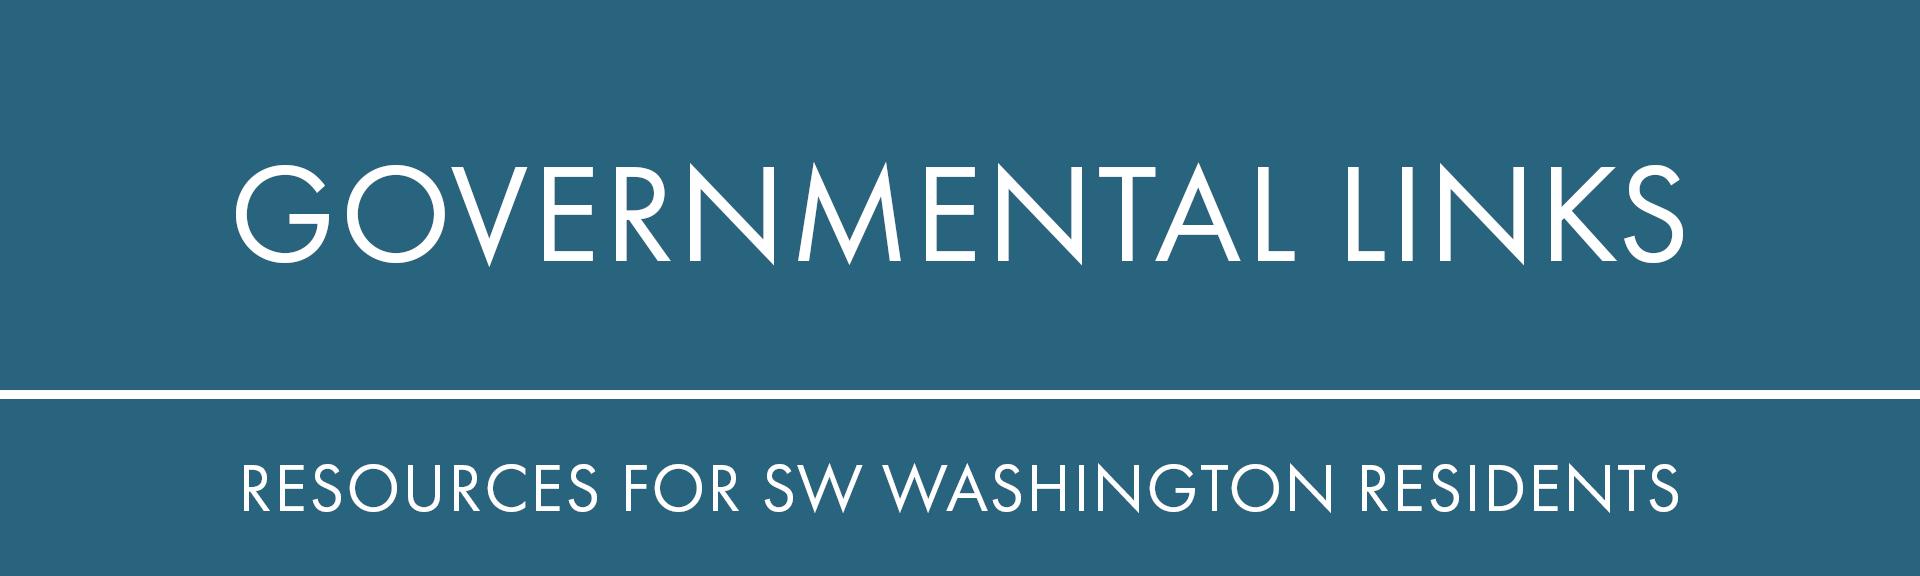 Website-Page-Header---Governmental-Links.png